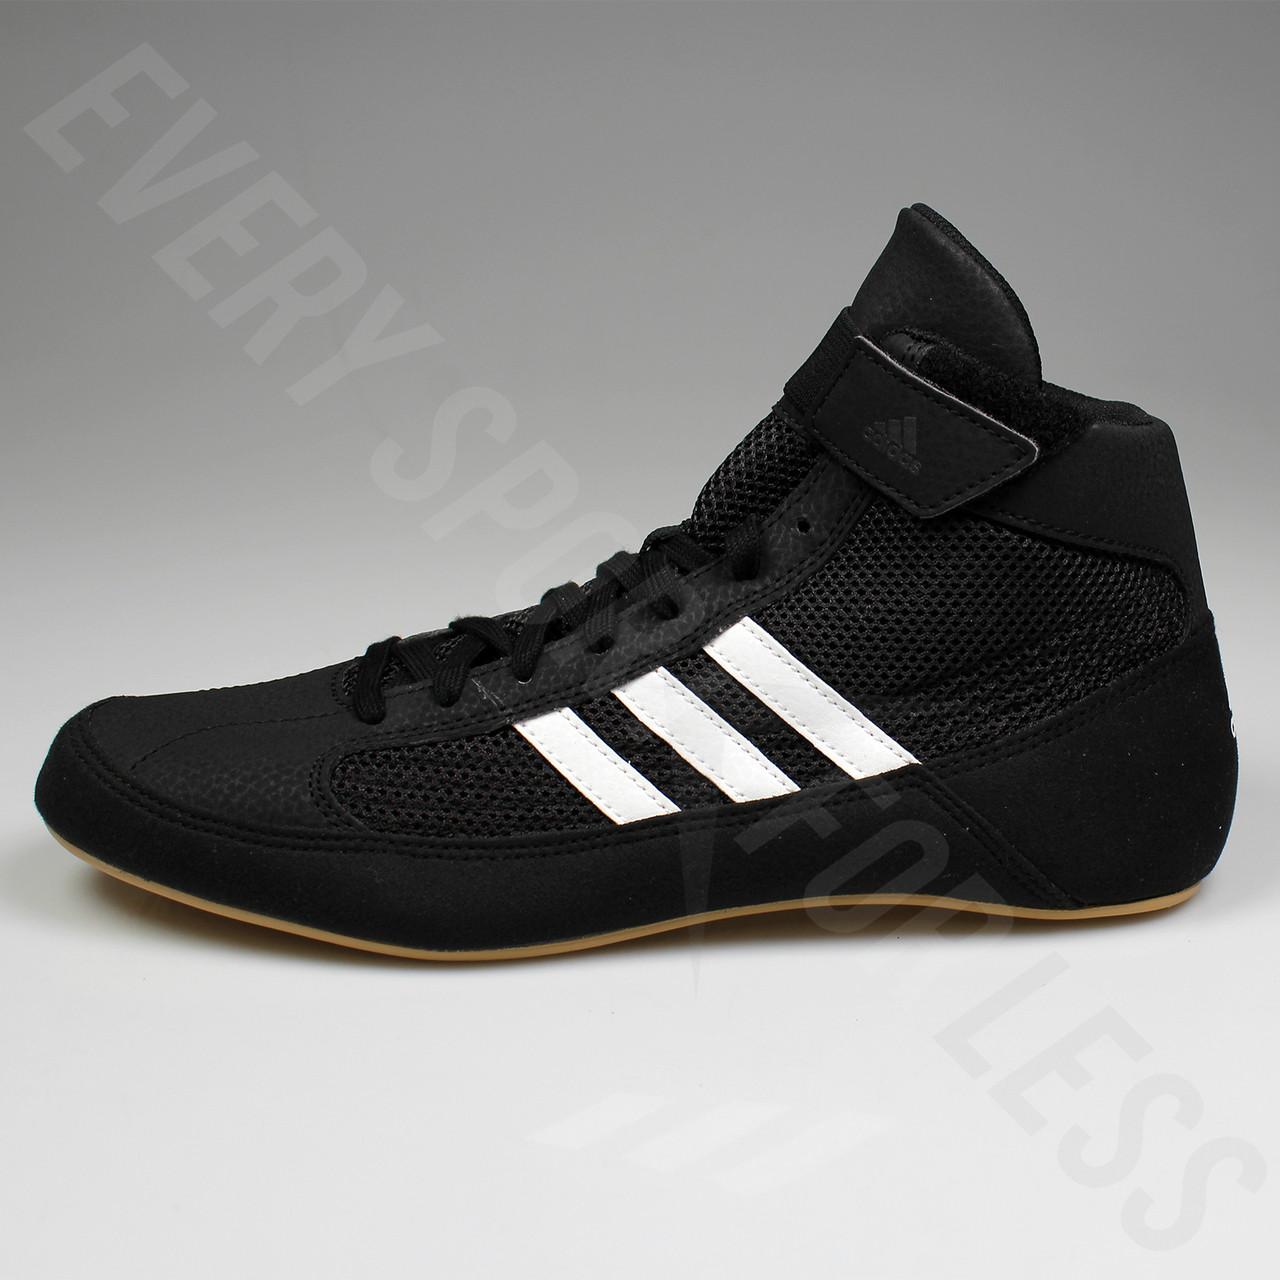 2c7aa9baf21 ... Adidas HVC 2 Mens Wrestling Shoes AQ3325 - Black   White ...